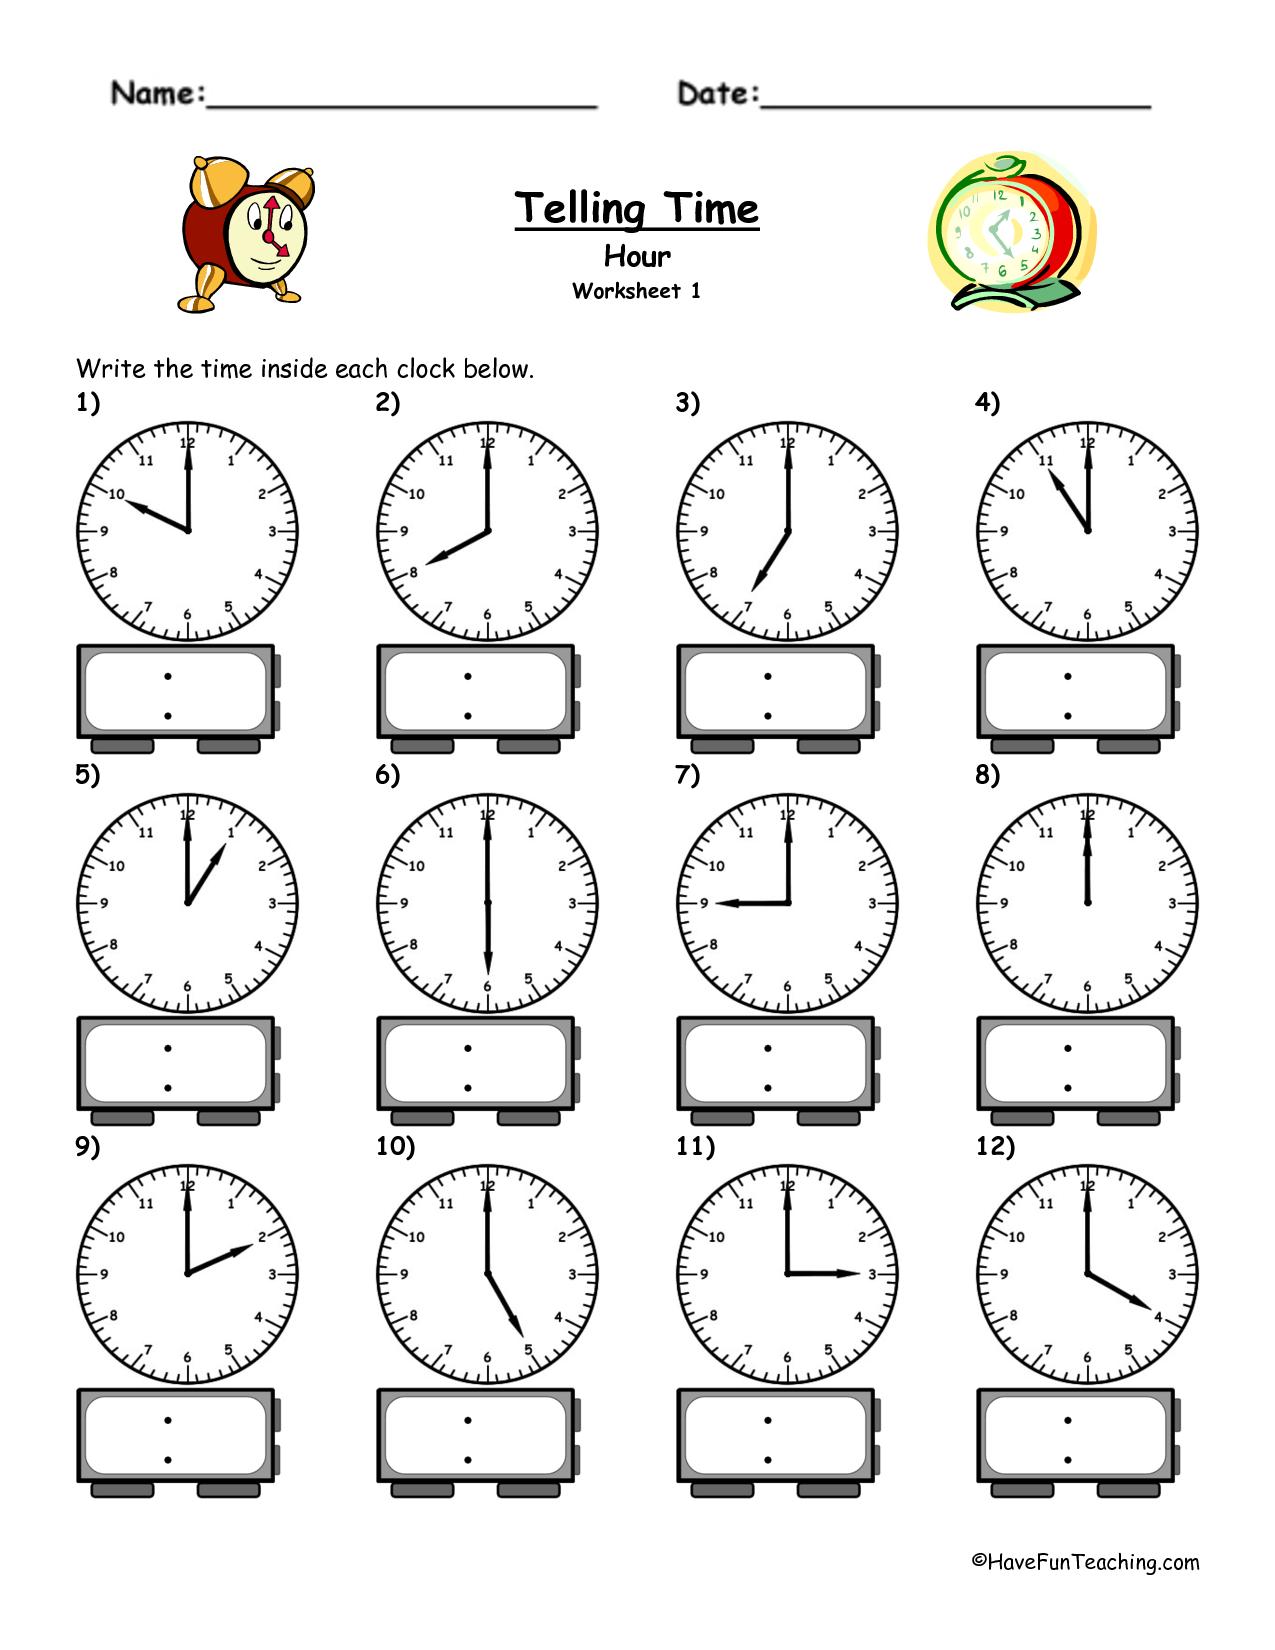 4 Best Images of Printable Clock Worksheet Telling Time ...